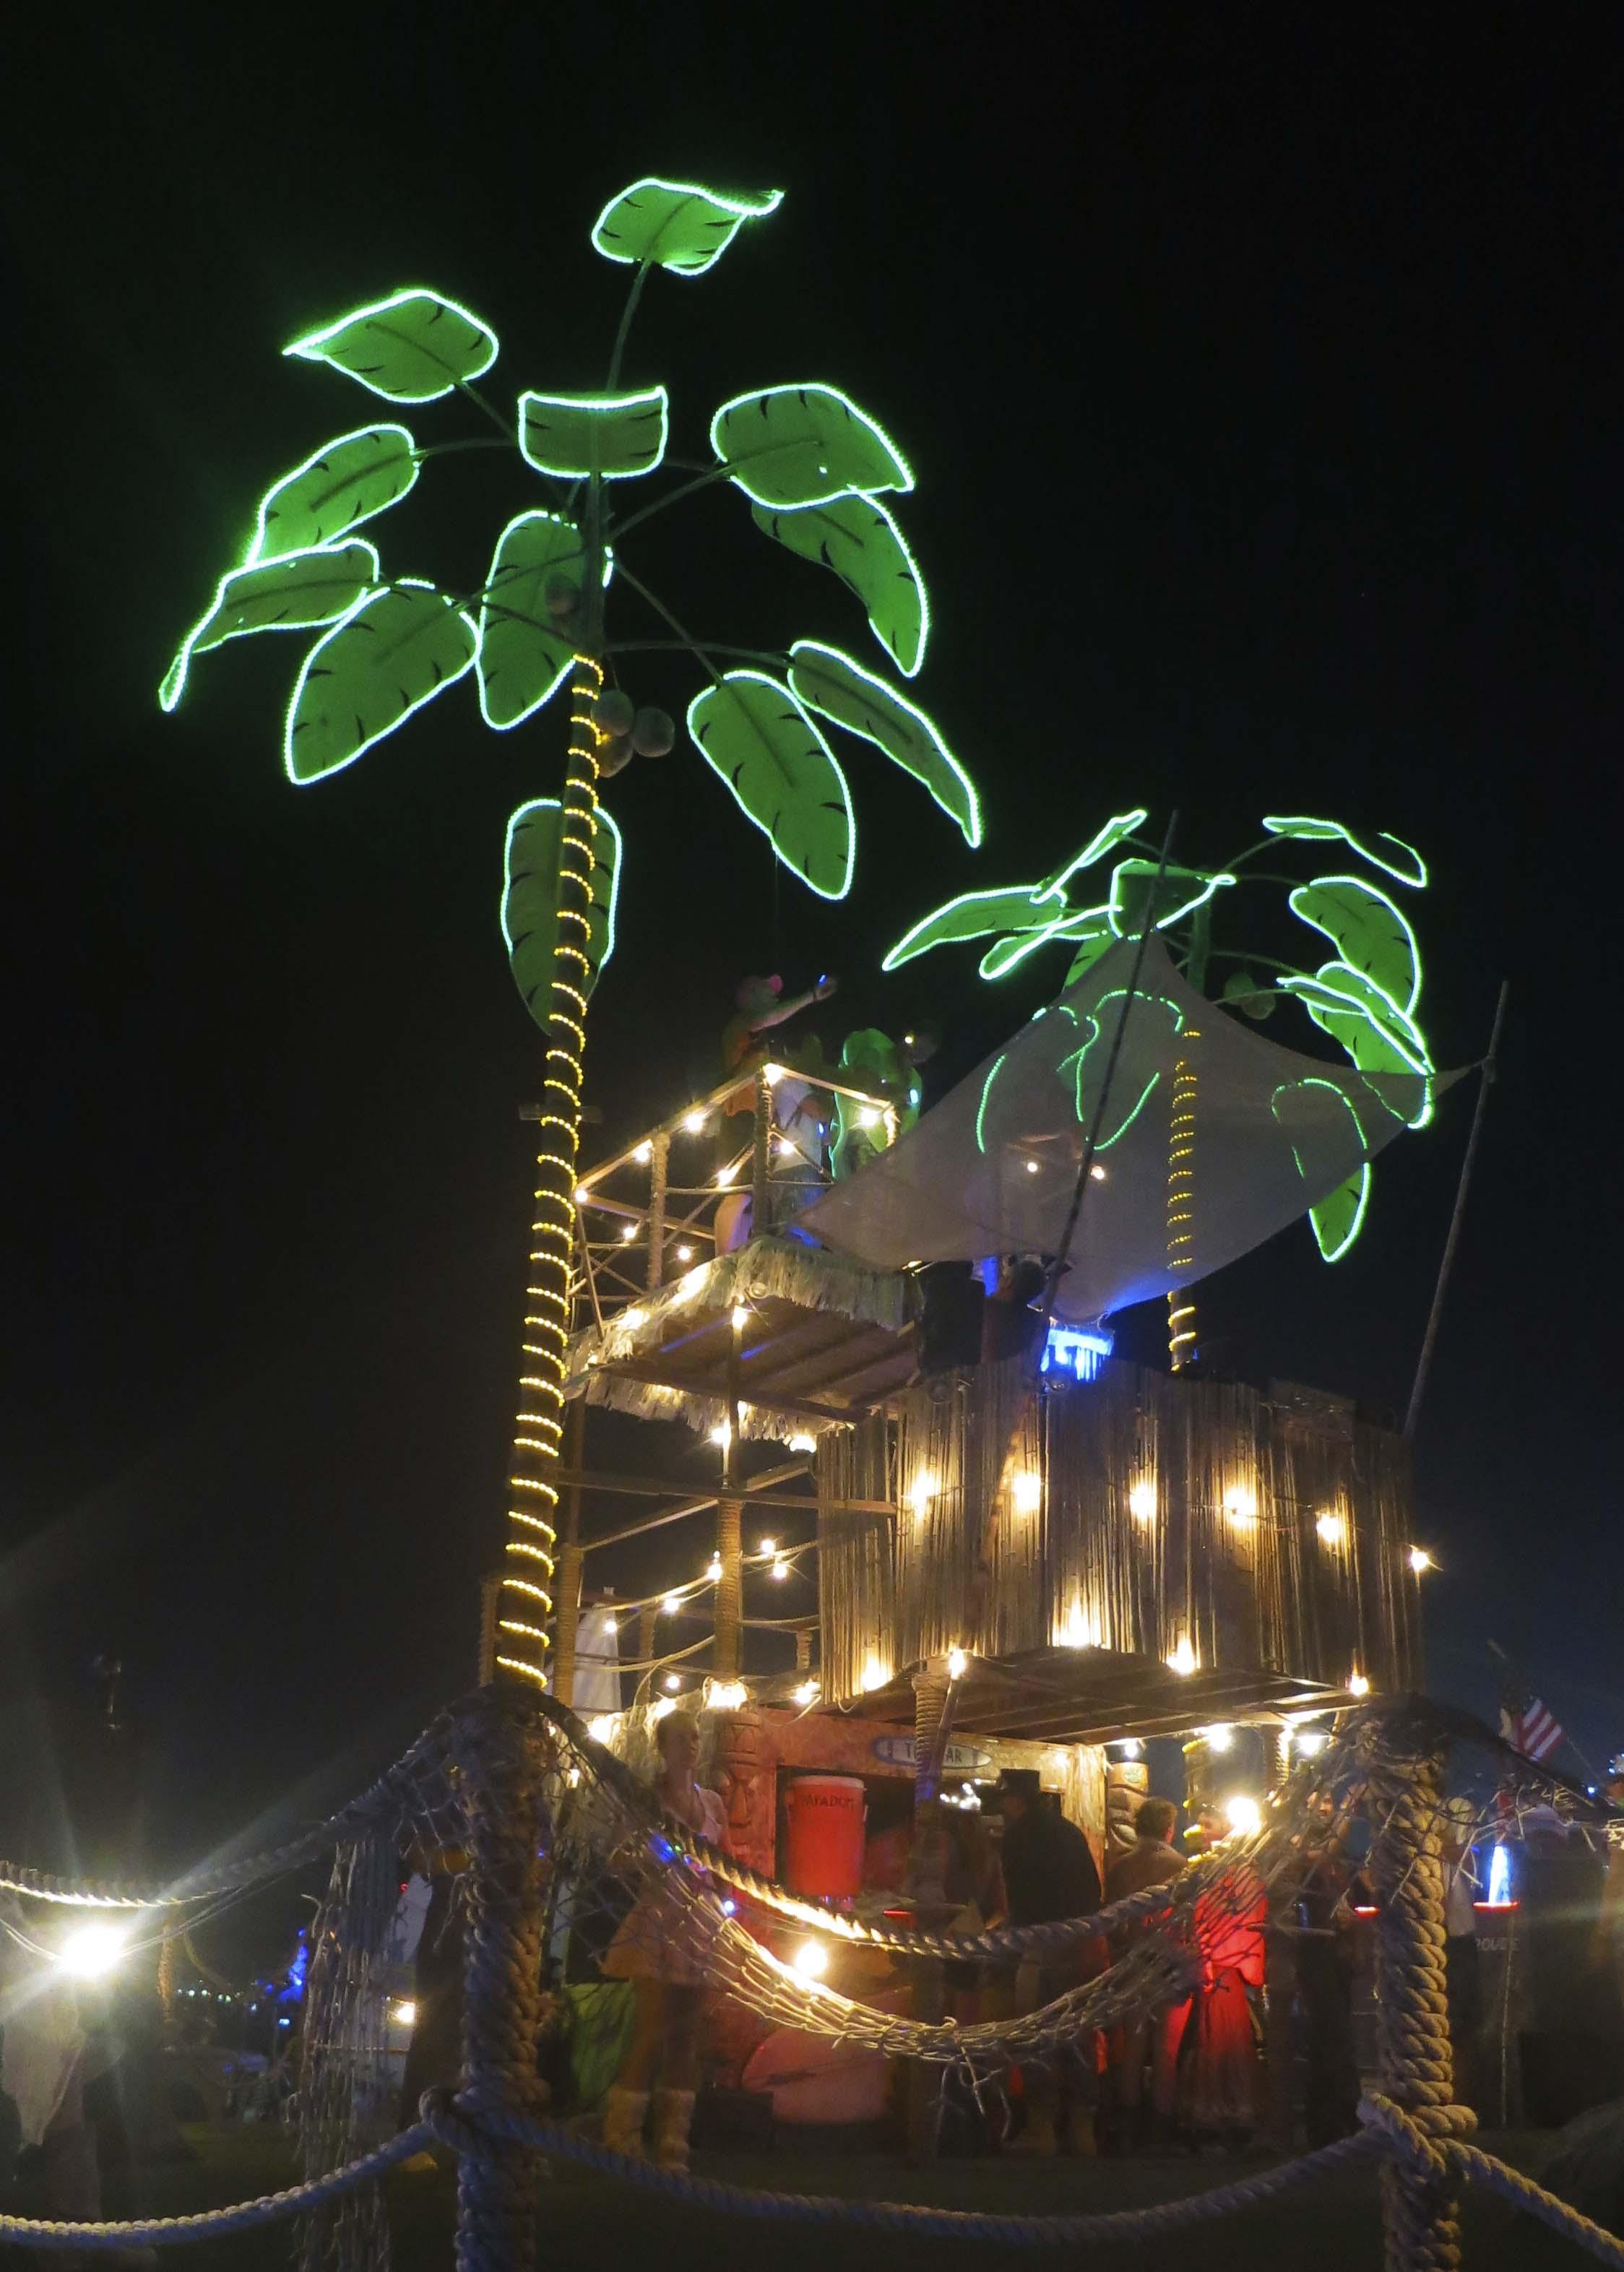 Palm tree mutant vehicle at Burning Man 2013.